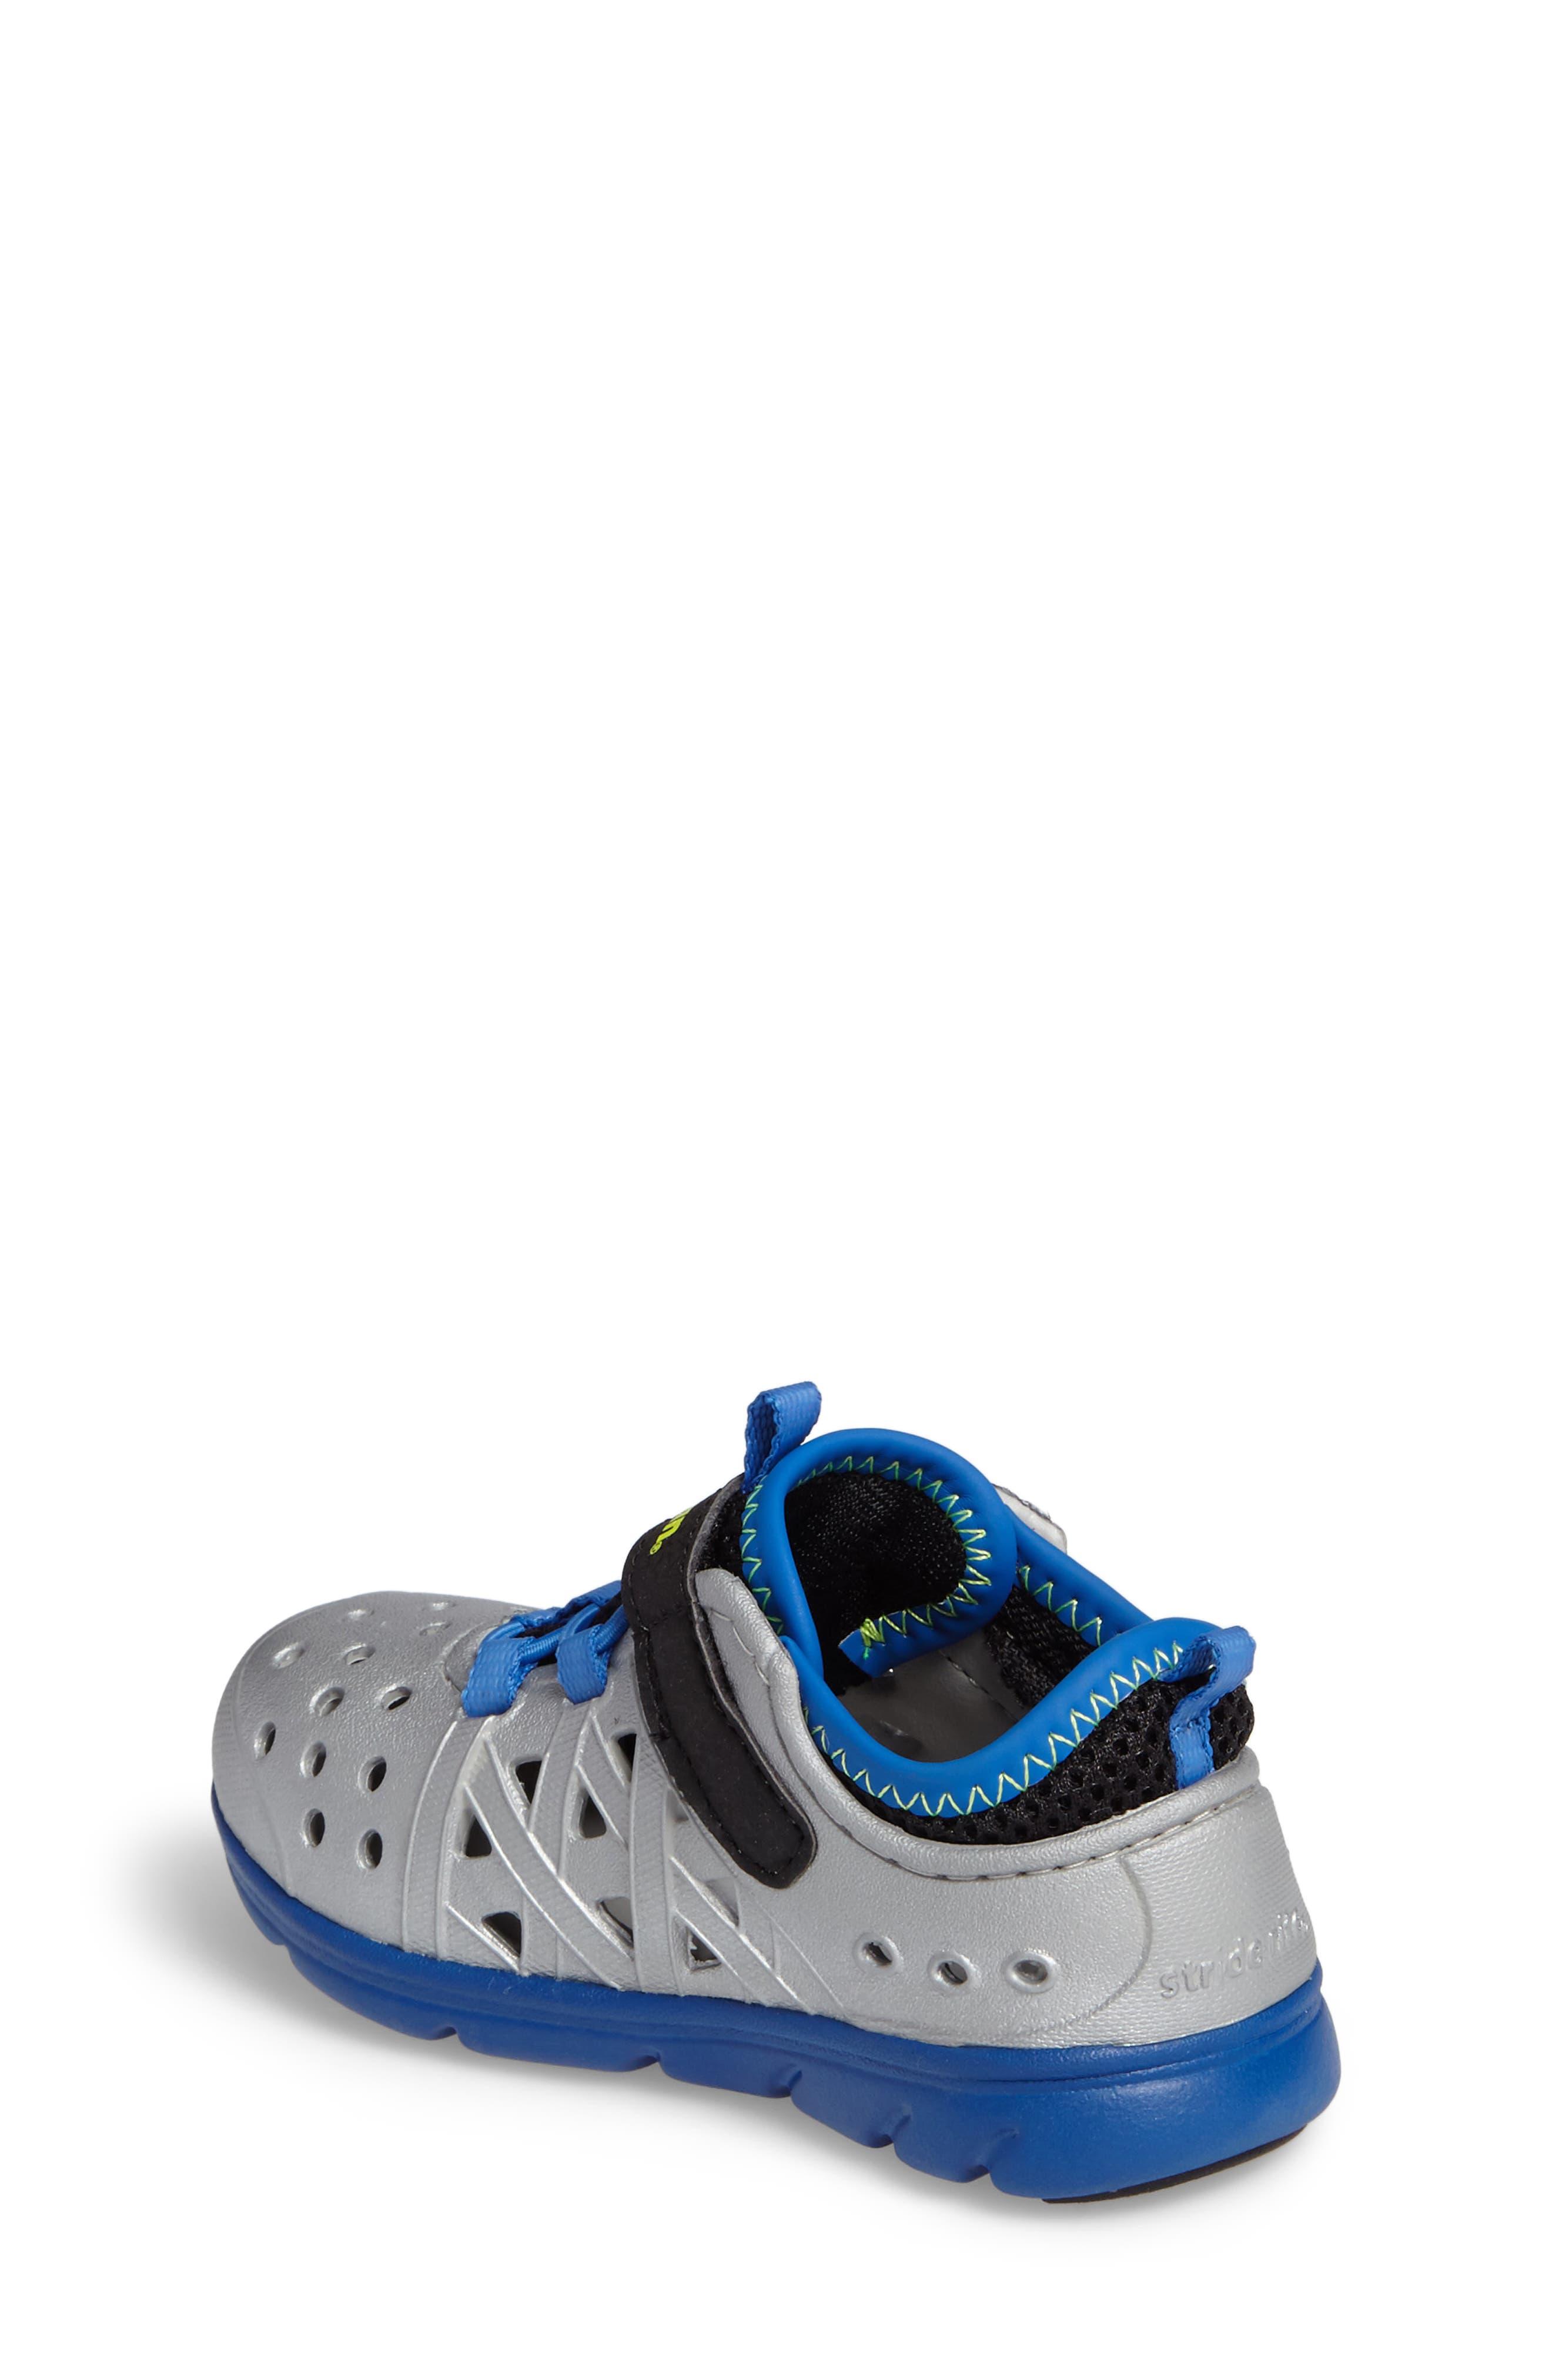 Made2Play<sup>®</sup> Phibian Sneaker,                             Alternate thumbnail 2, color,                             Silver Metallic